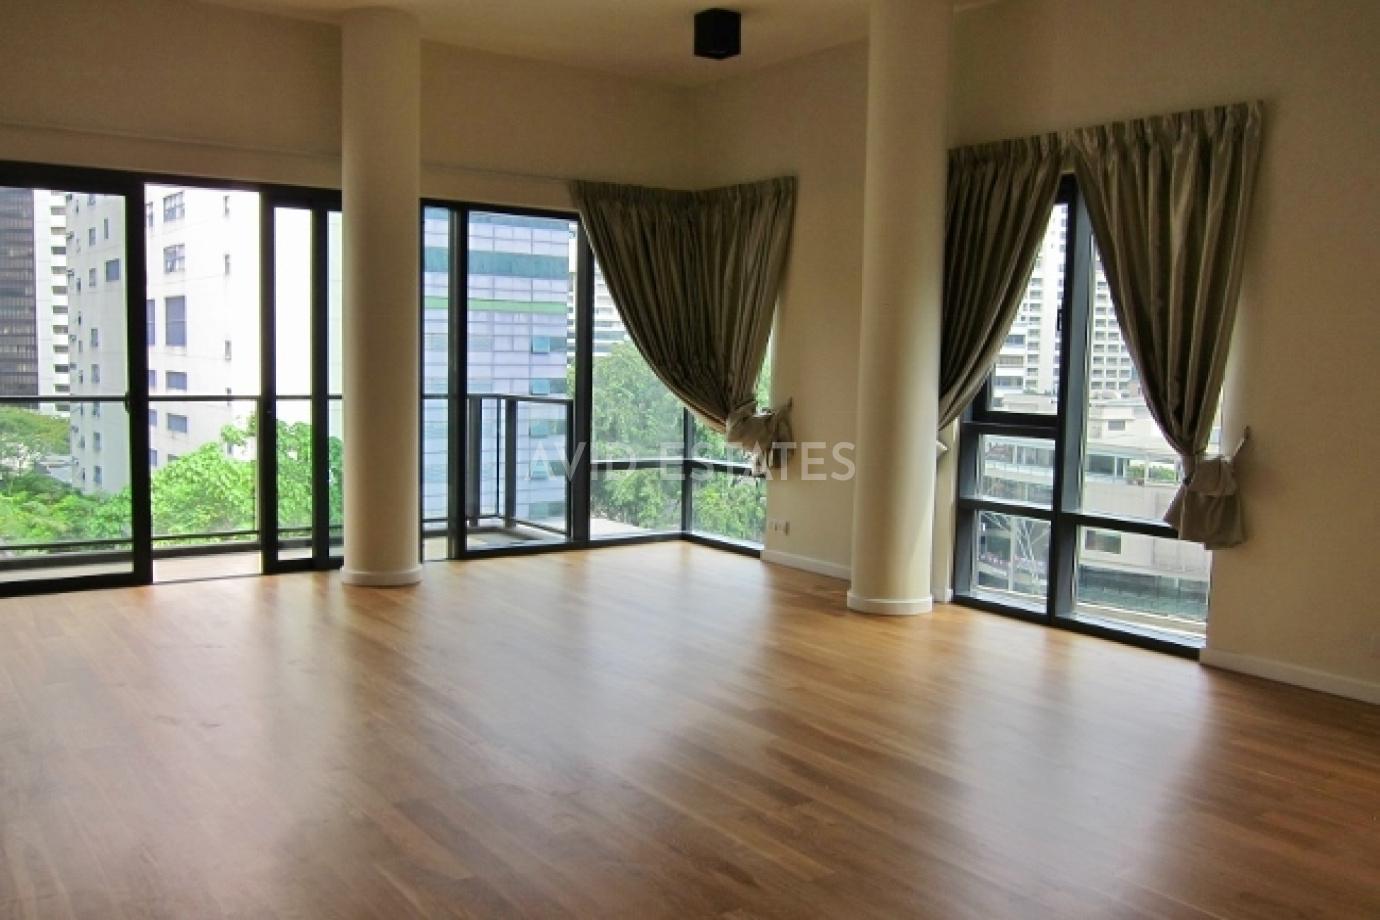 St Mary Residences,Kuala Lumpur, 3 Bedrooms Bedrooms, ,4 BathroomsBathrooms,Condominium / Serviced Residence,For Sale,St Mary Residences,1206